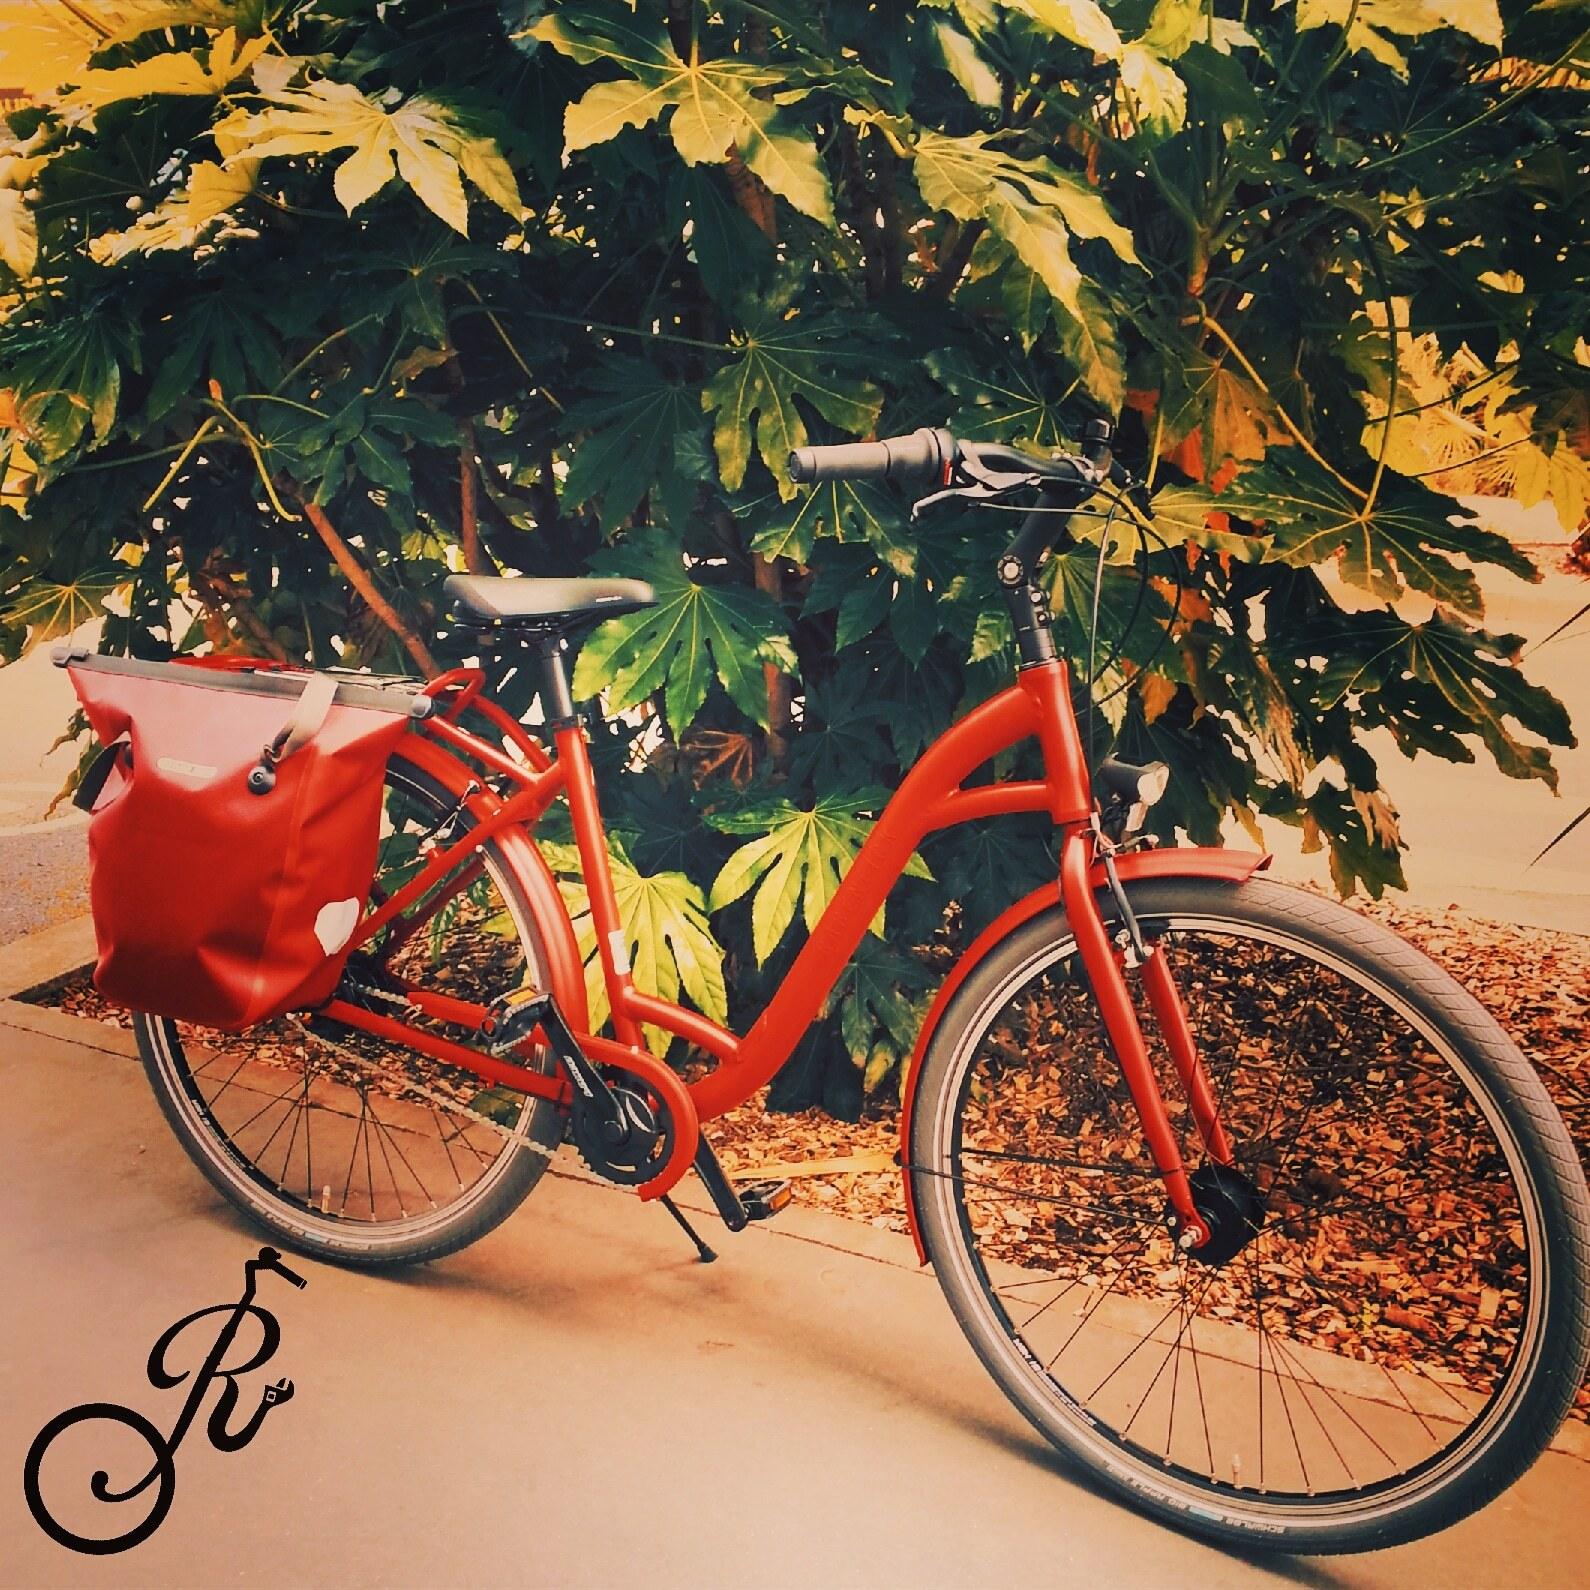 Galerie d'image - Raconte-moi un vélo